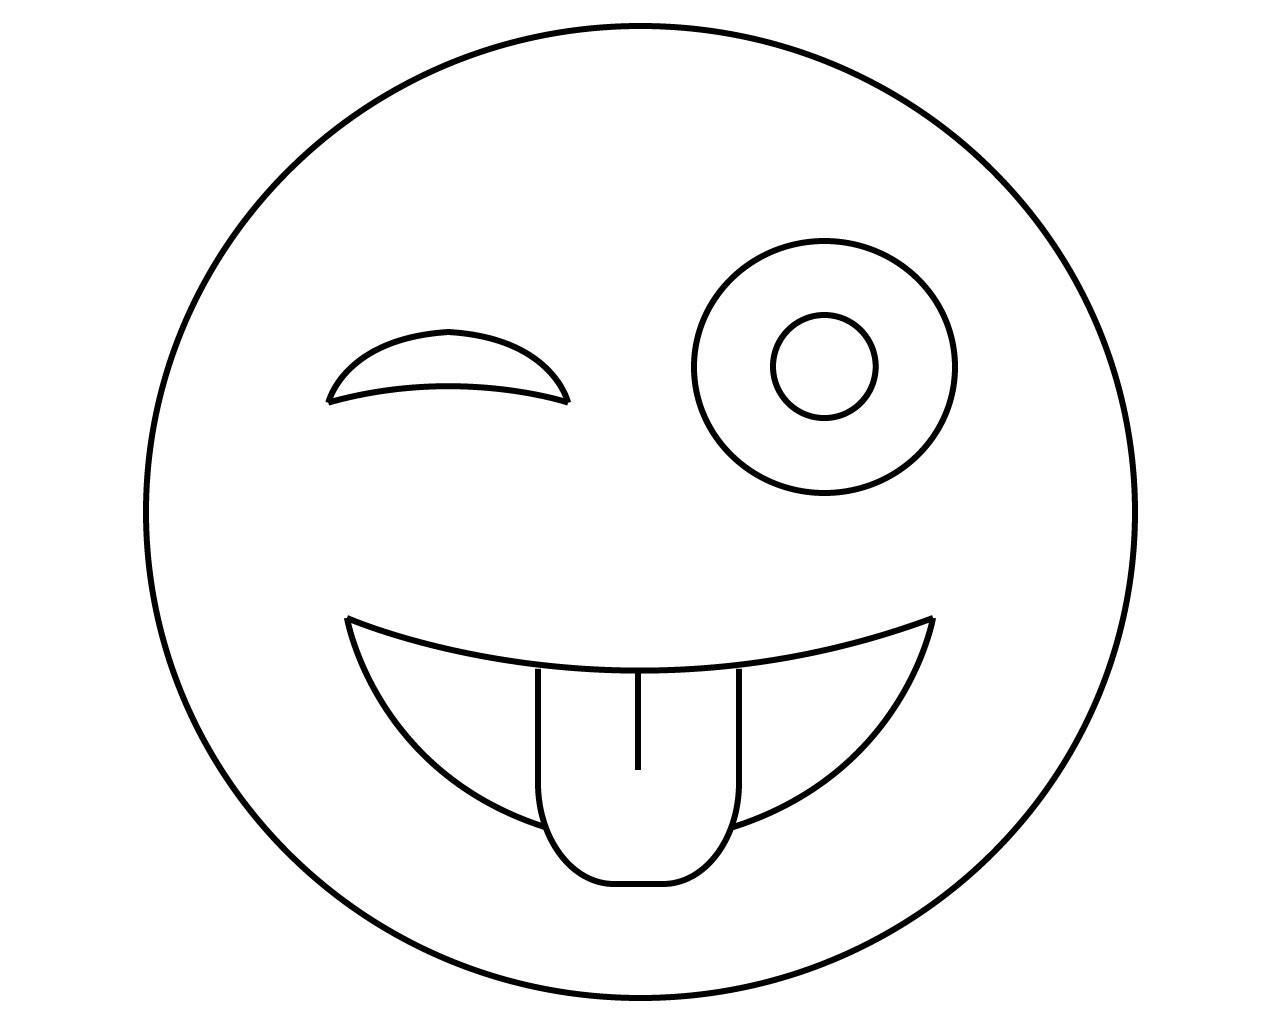 18 Printable Emoji Coloring Pictures Emoji Coloring Pages Coloring Pages Coloring Pictures